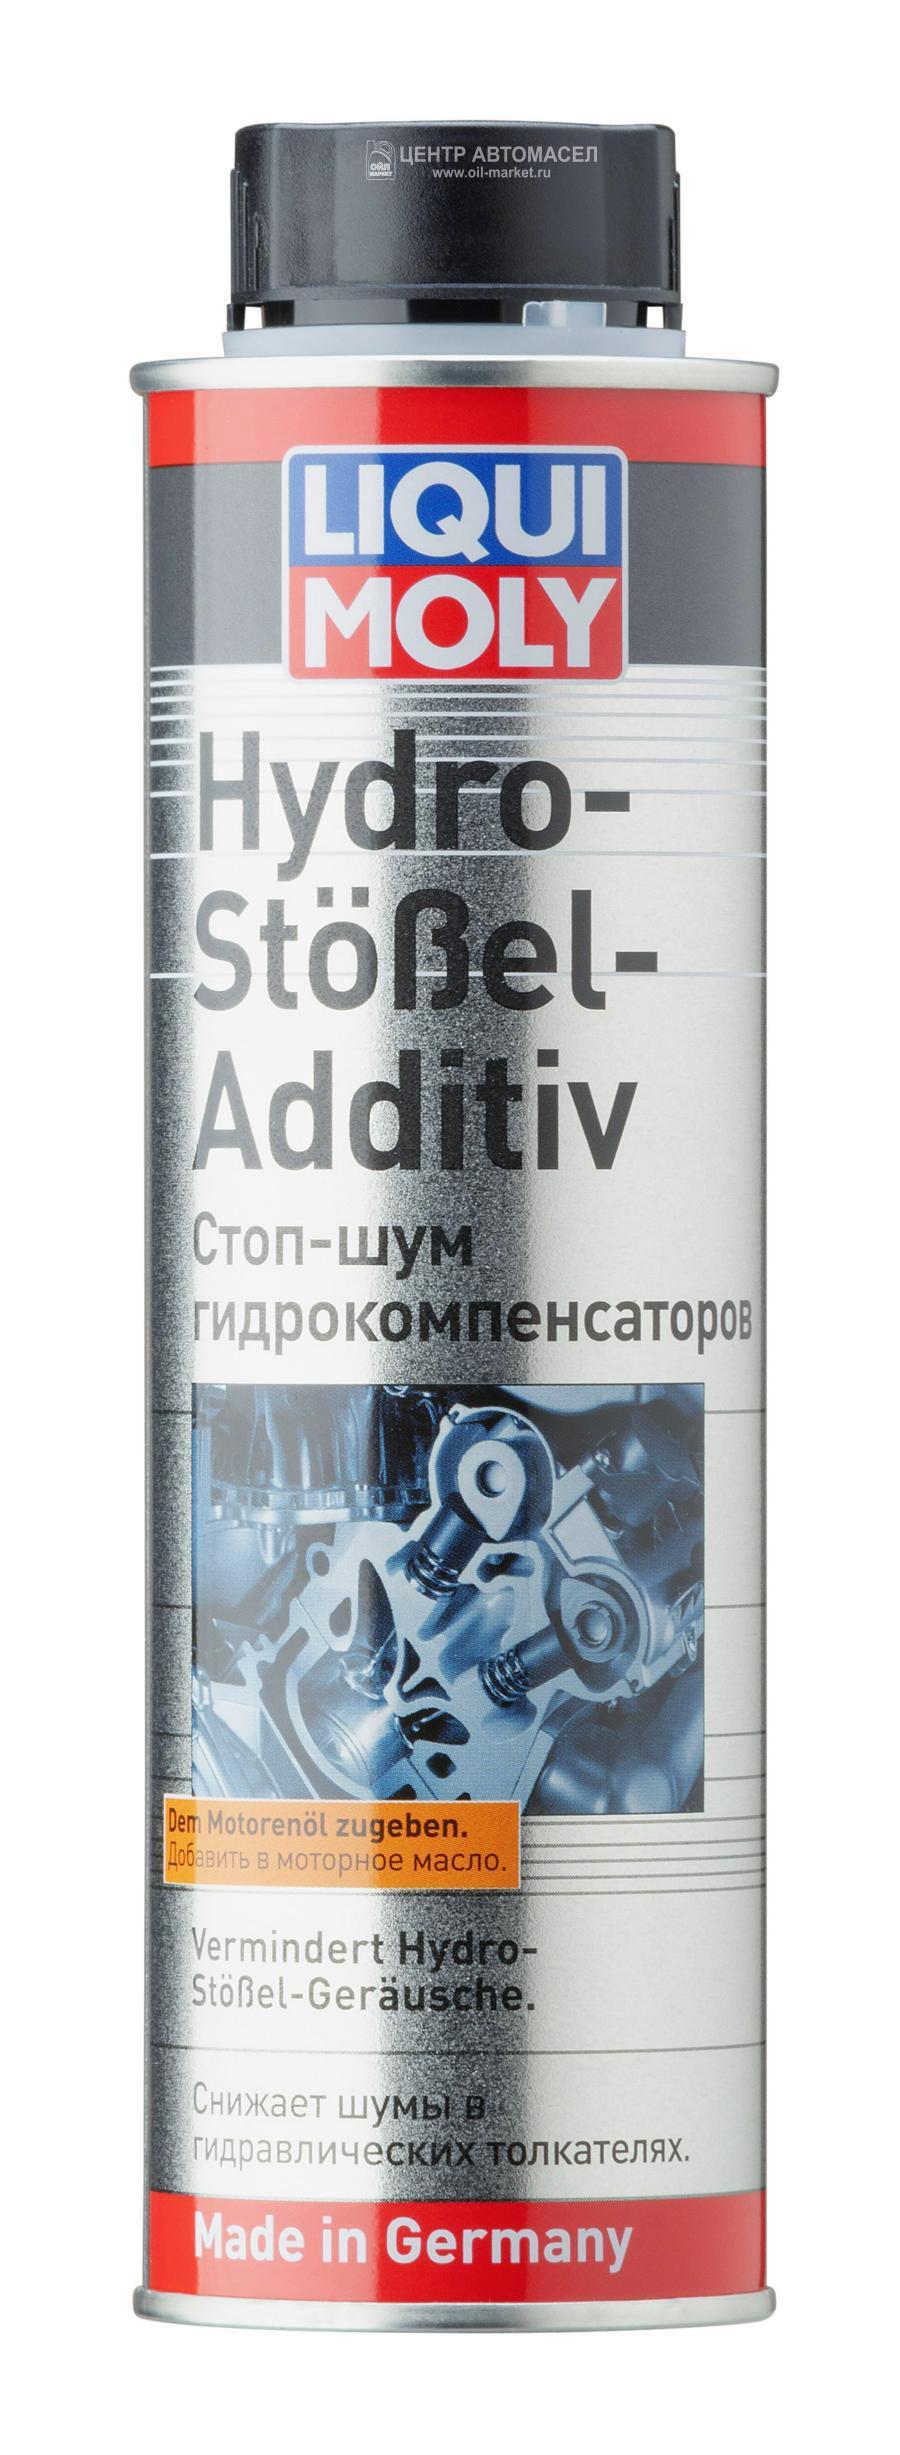 Стоп-шум гидрокомпенсаторов Hydro-Stossel-Additiv (0,3 л)